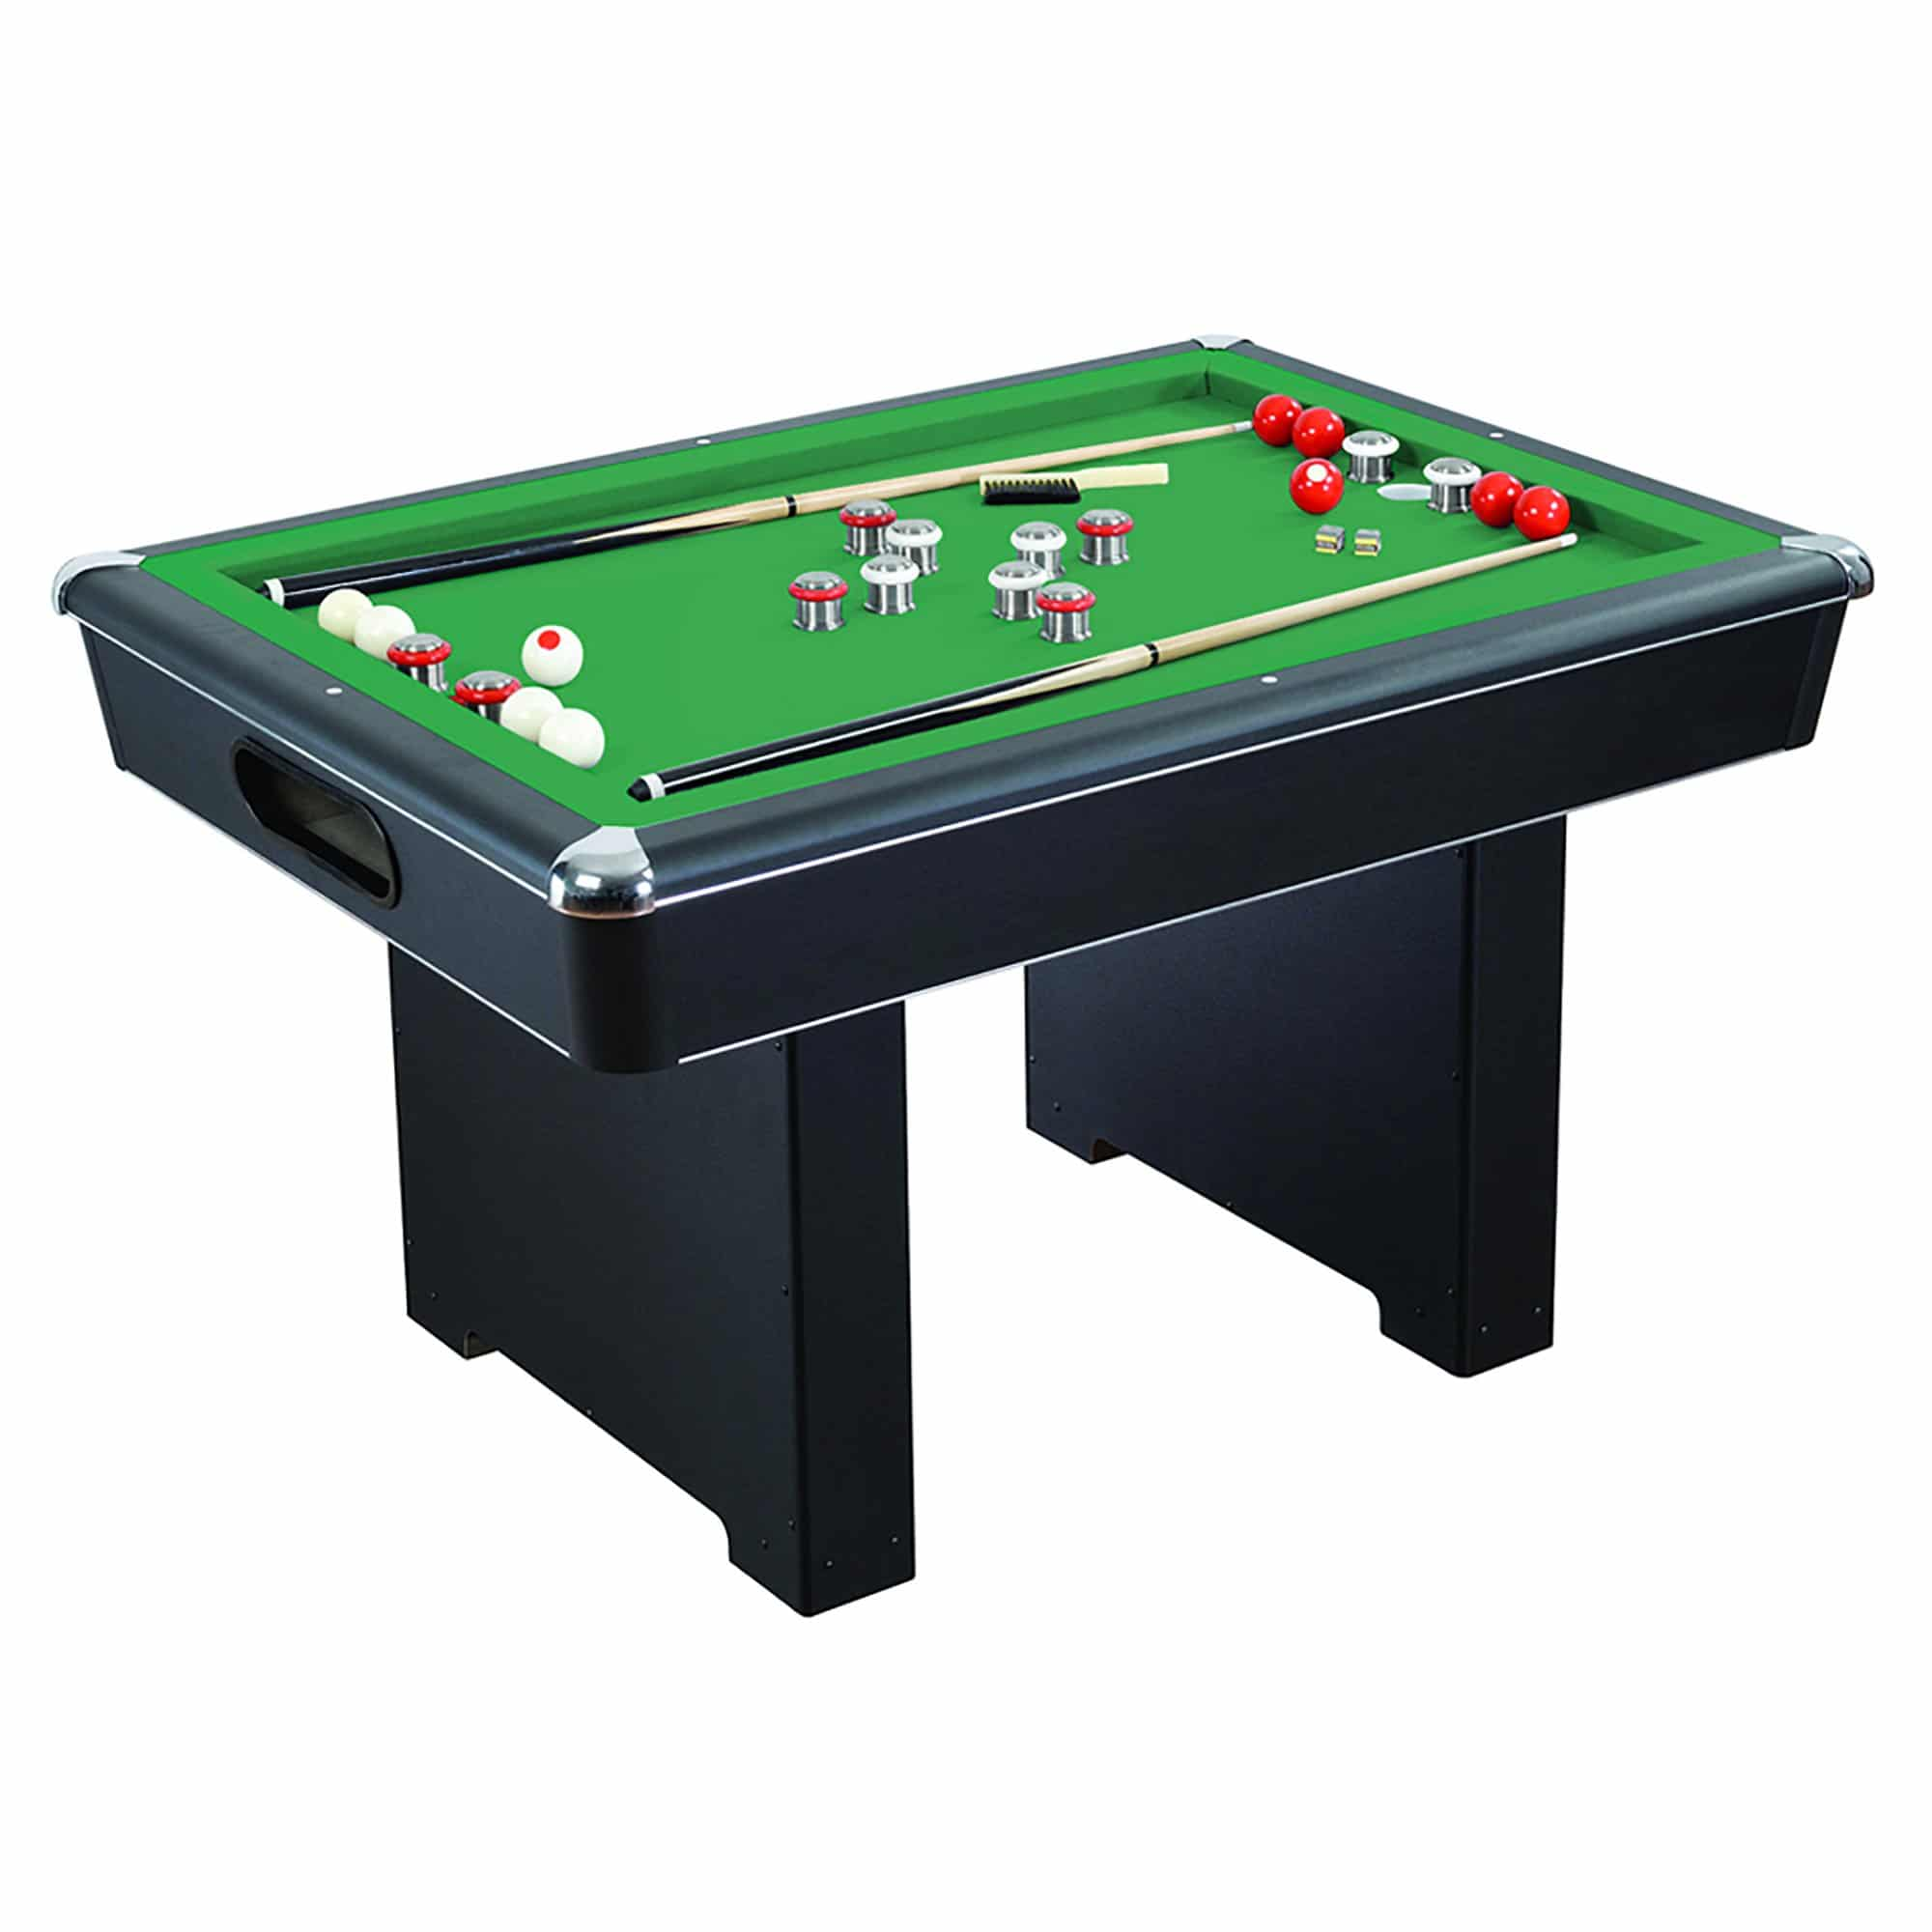 Merveilleux Renegade 54 In Slate Bumper Pool Table